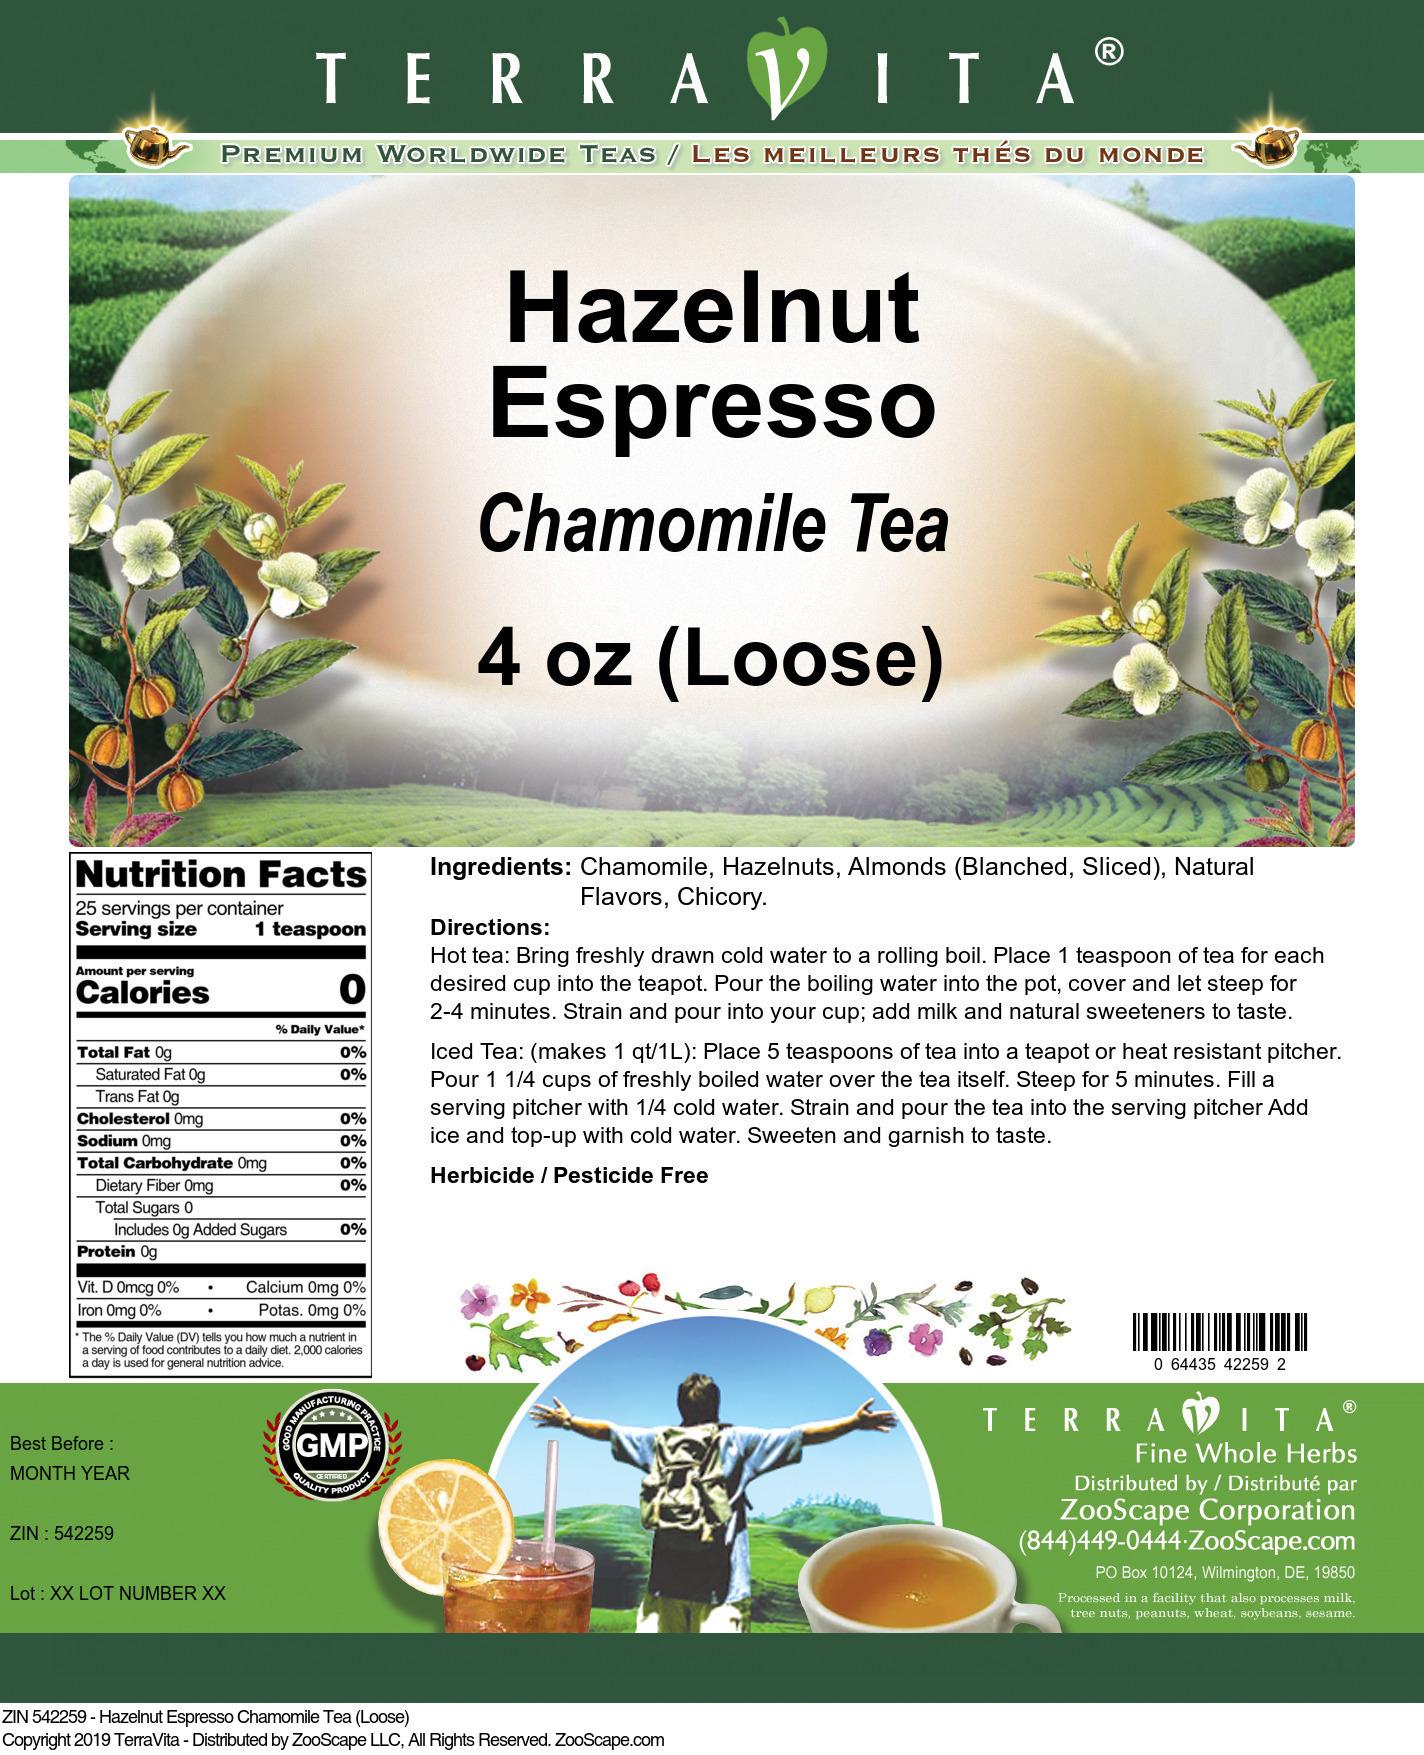 Hazelnut Espresso Chamomile Tea